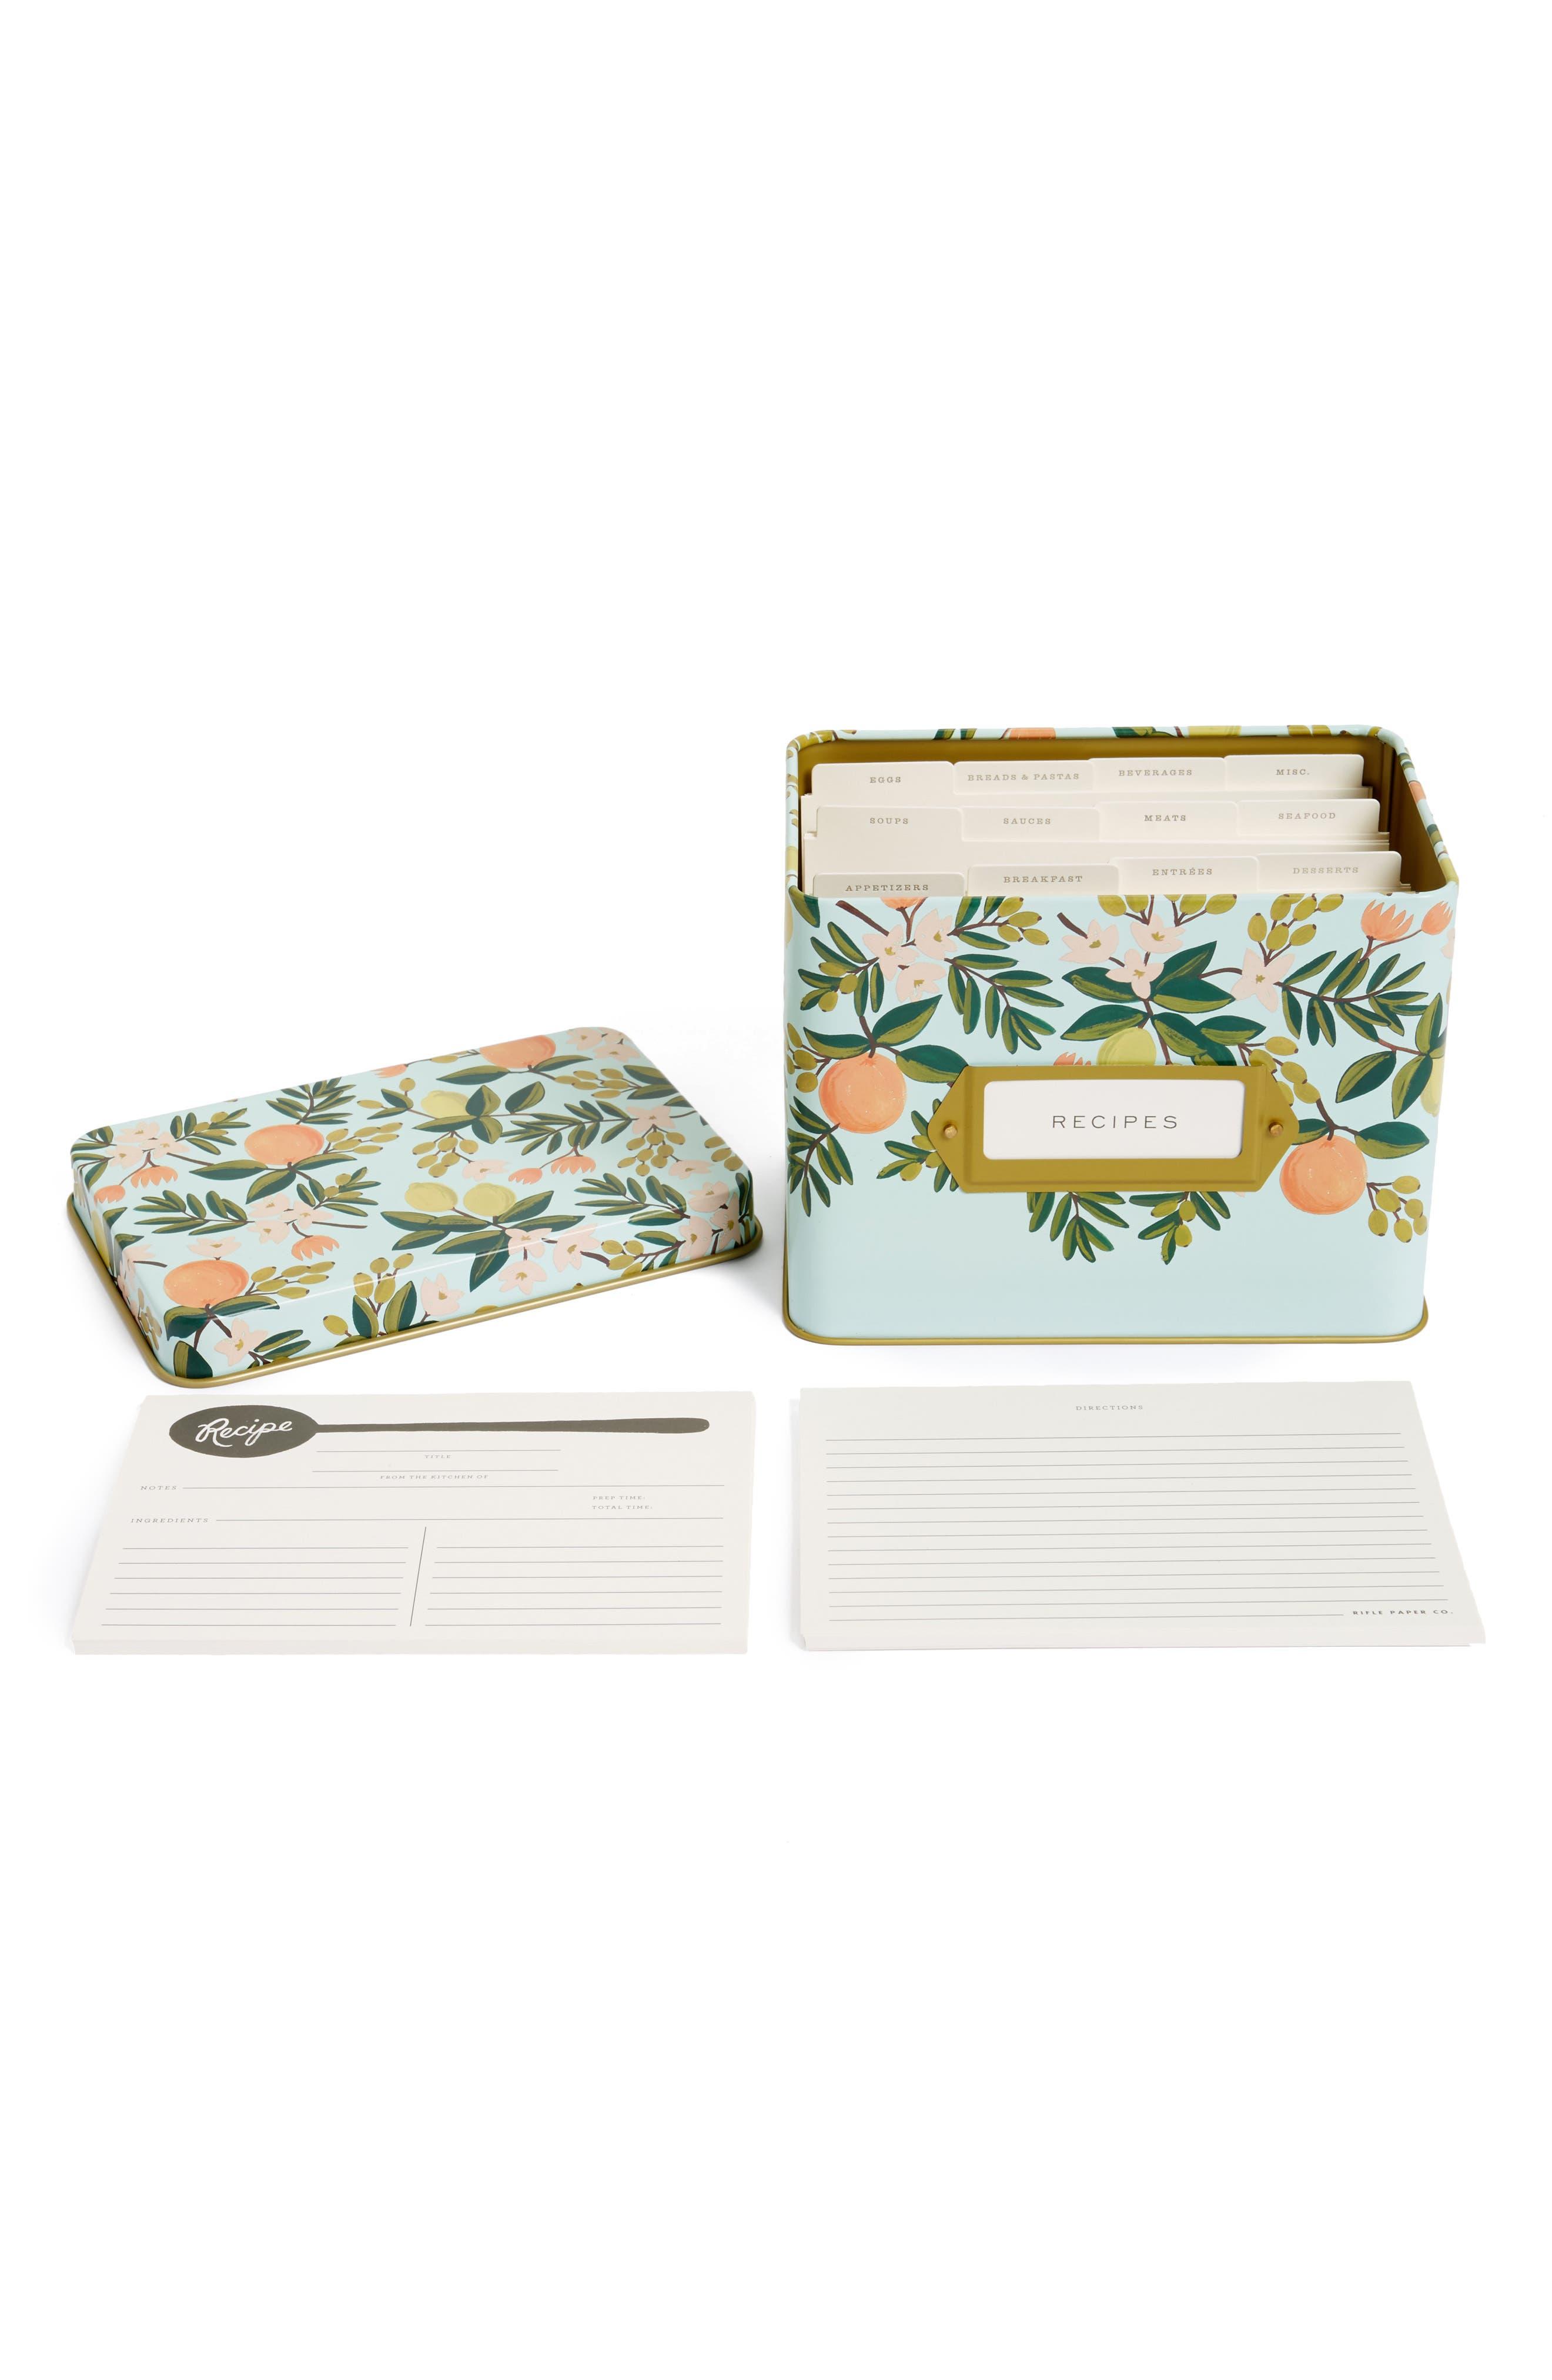 Main Image - Rifle Paper Co. Citrus Floral Recipe Tin